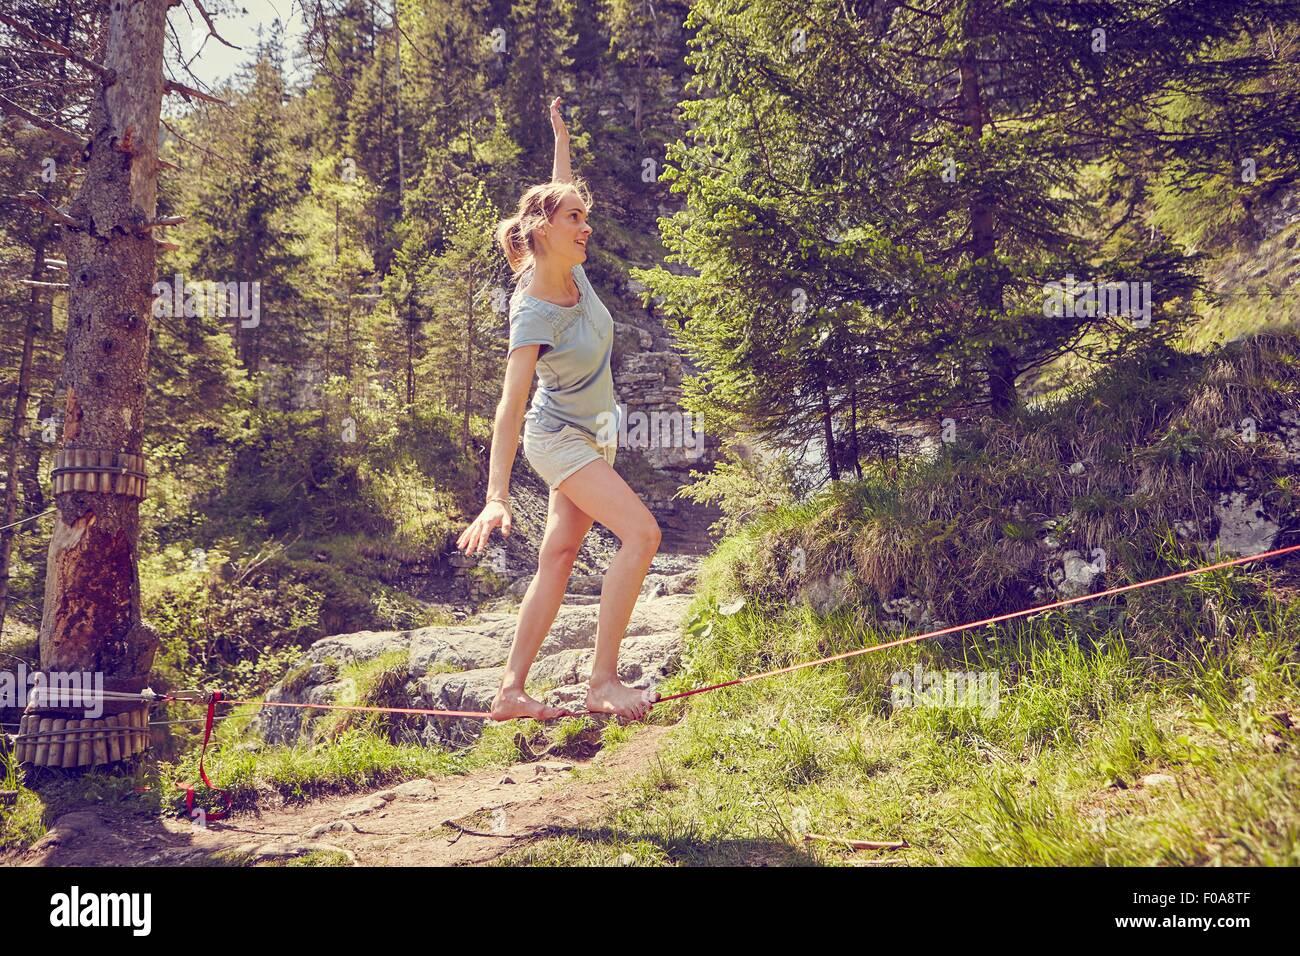 Woman balancing on rope, Ehrwald, Tyrol, Austria - Stock Image